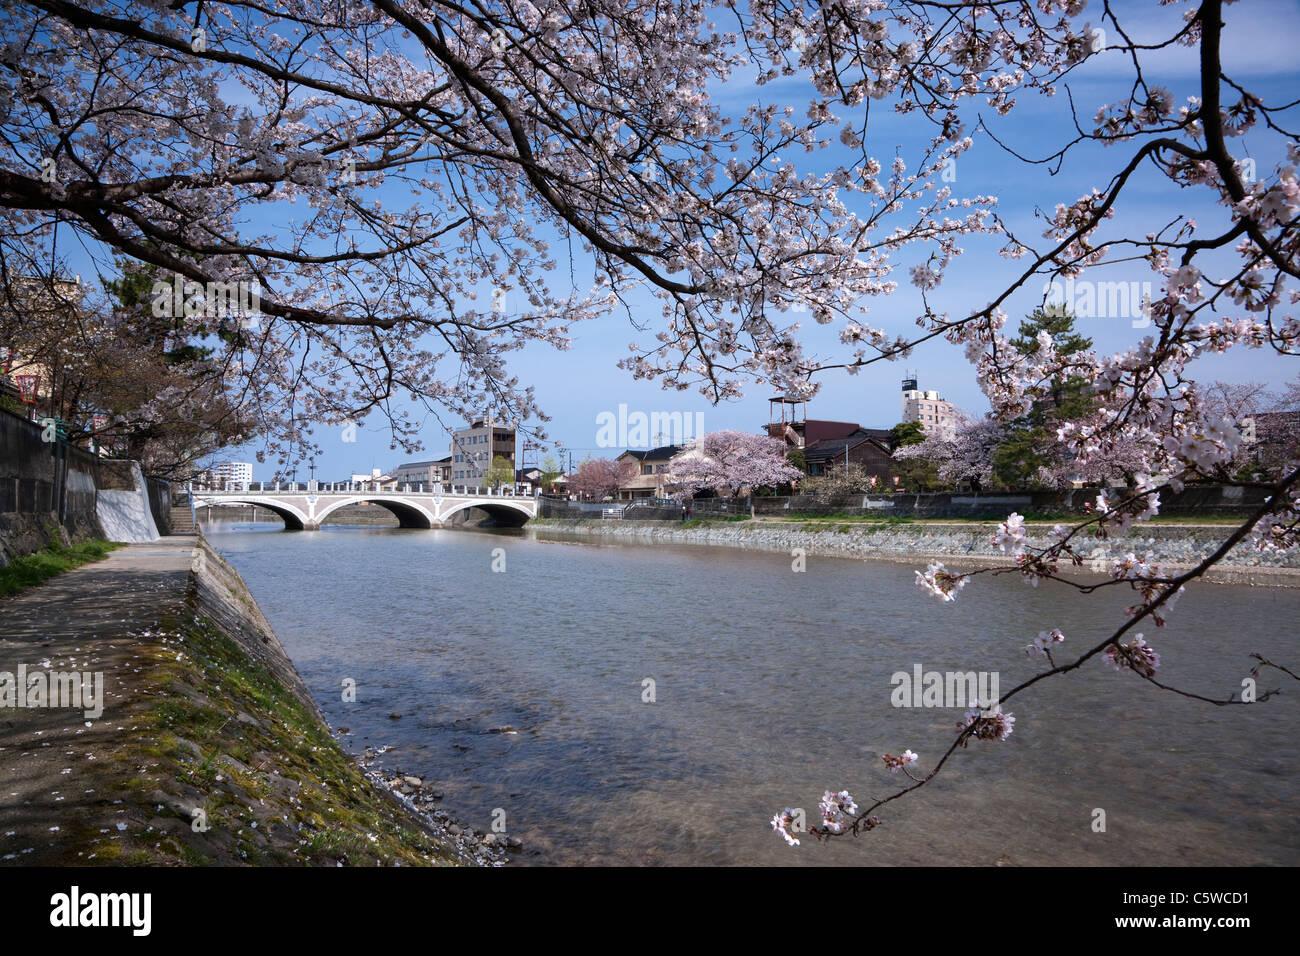 Asano River and Asanogawa Ohashi Bridge, Kanazawa, Ishikawa, Japan - Stock Image